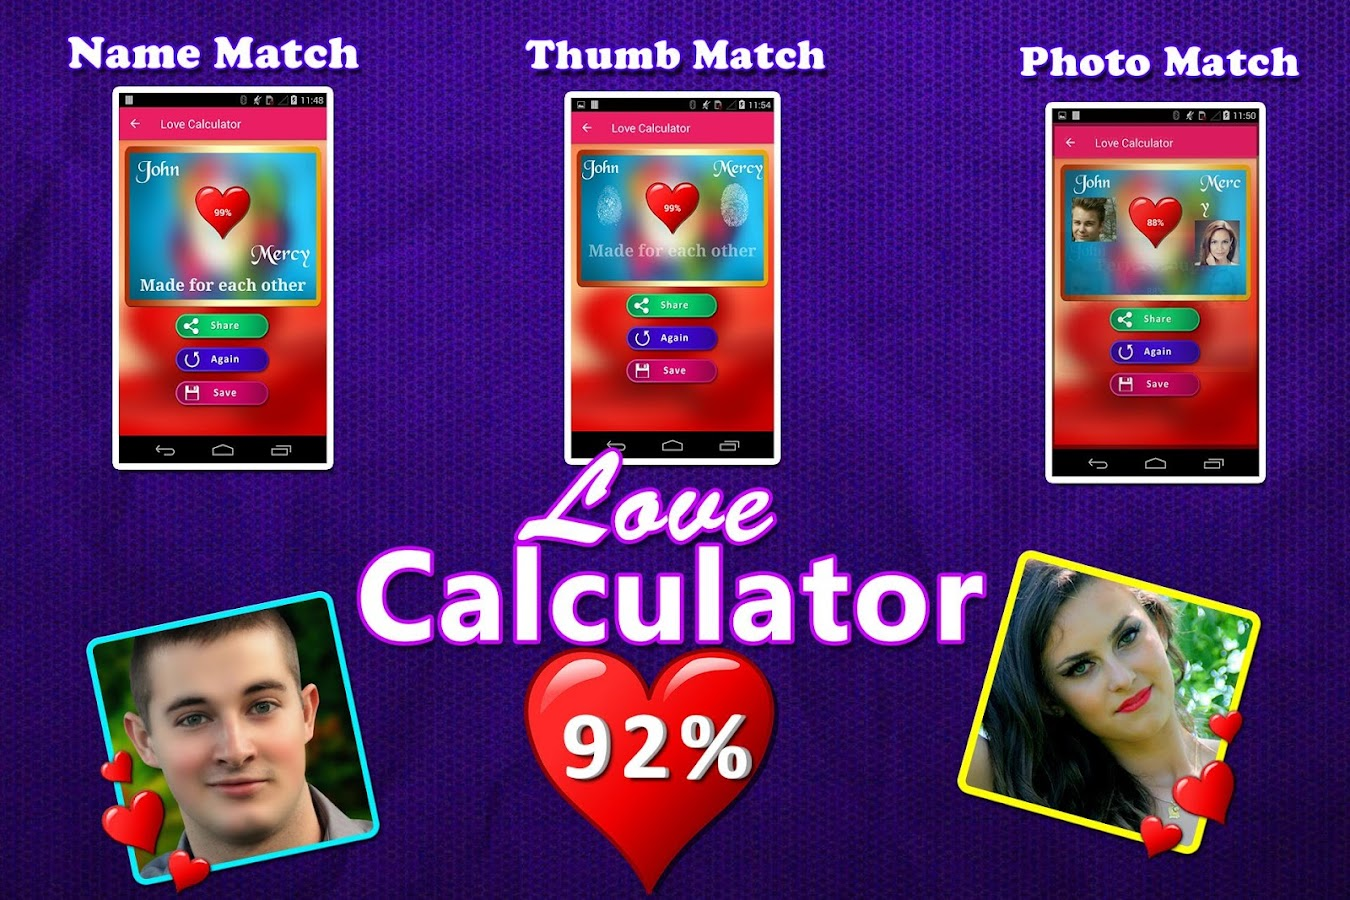 Uncategorized Love Calculator Game Online love calculator match by name photofingerprint android apps screenshot